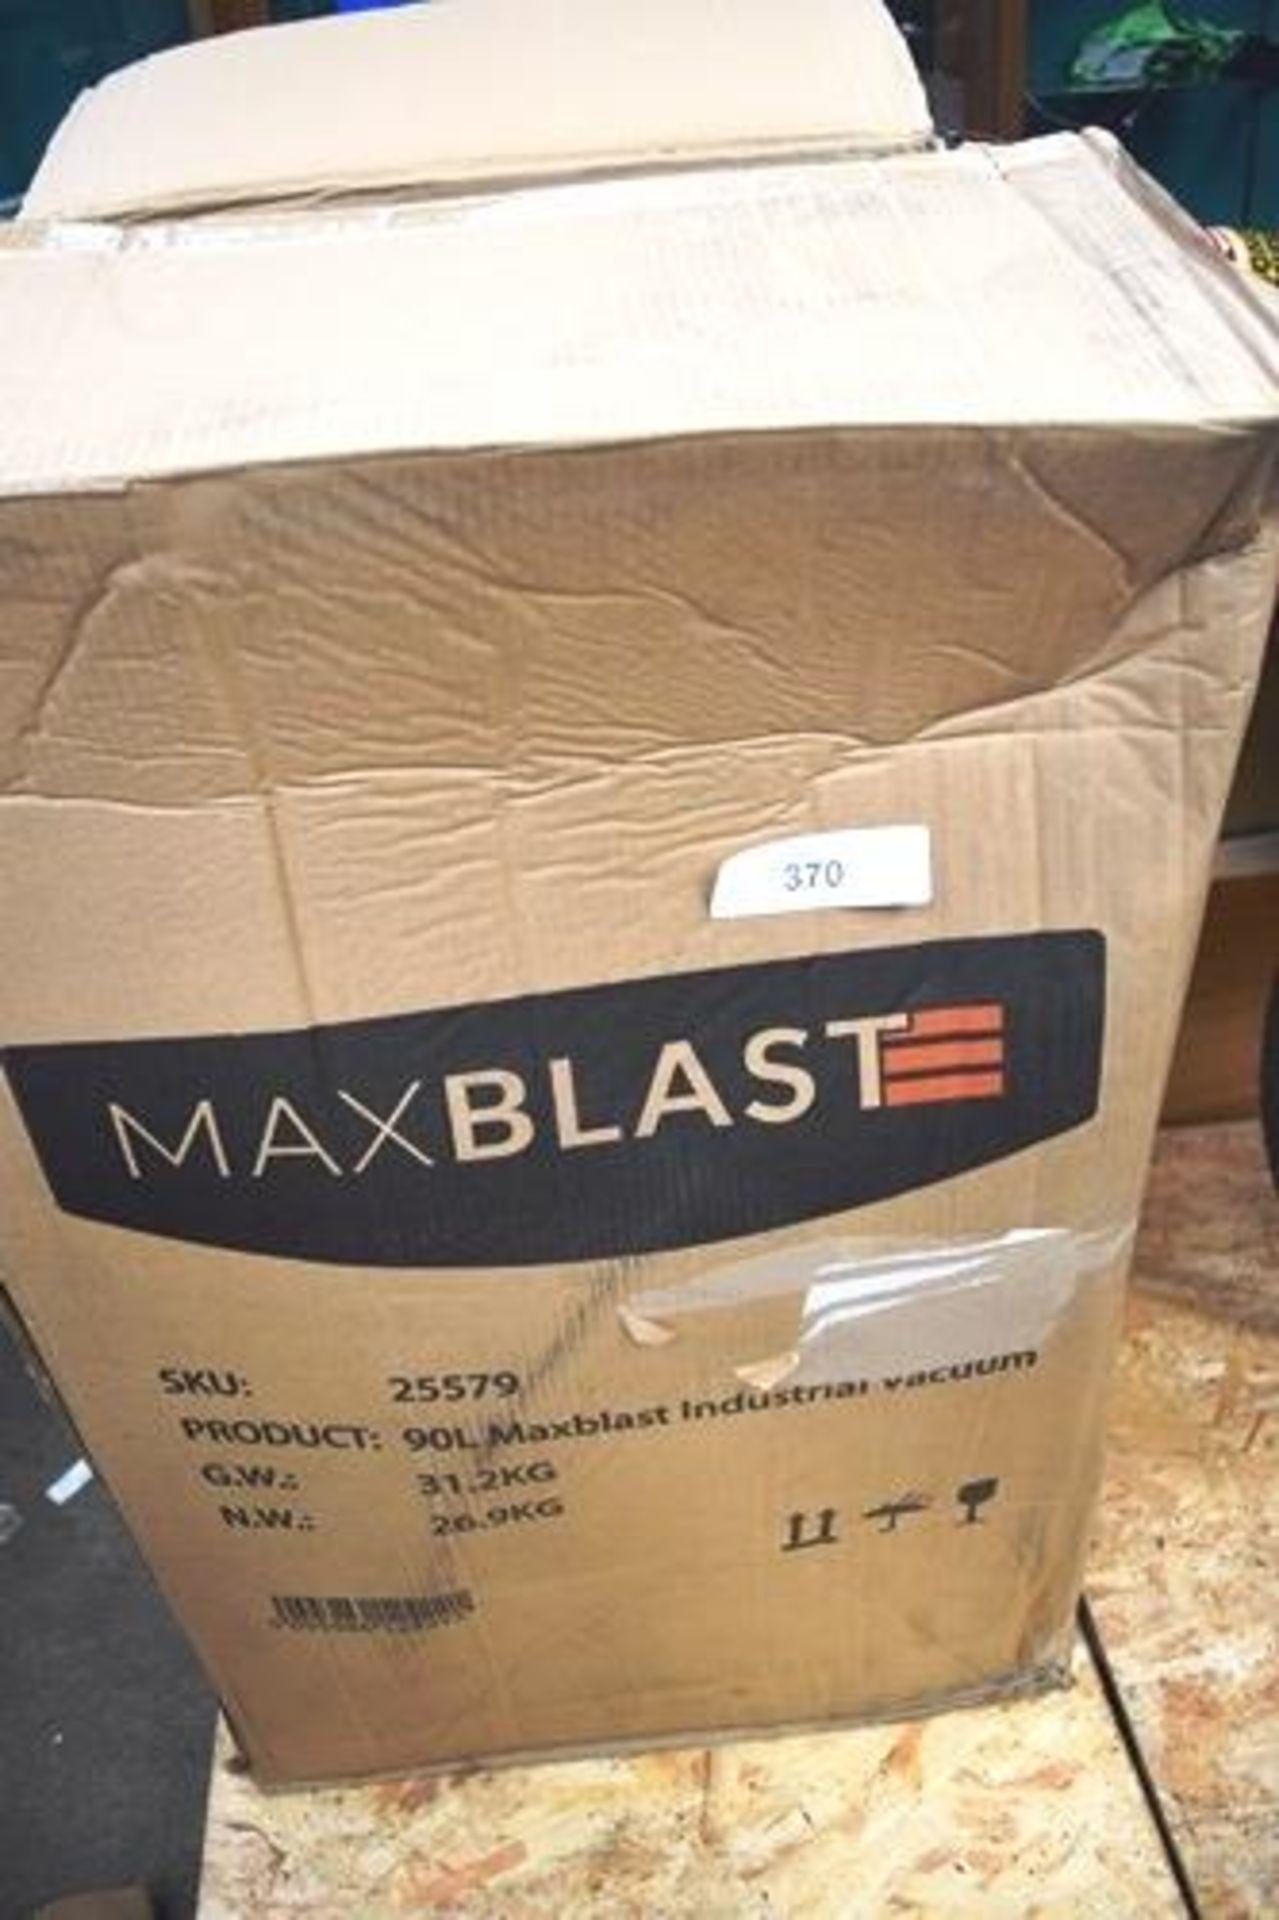 1 x Max Blast wet & dry 90ltr industrial vacuum, SKU: 25579 - New in box, box slightly tatty ( - Image 4 of 4